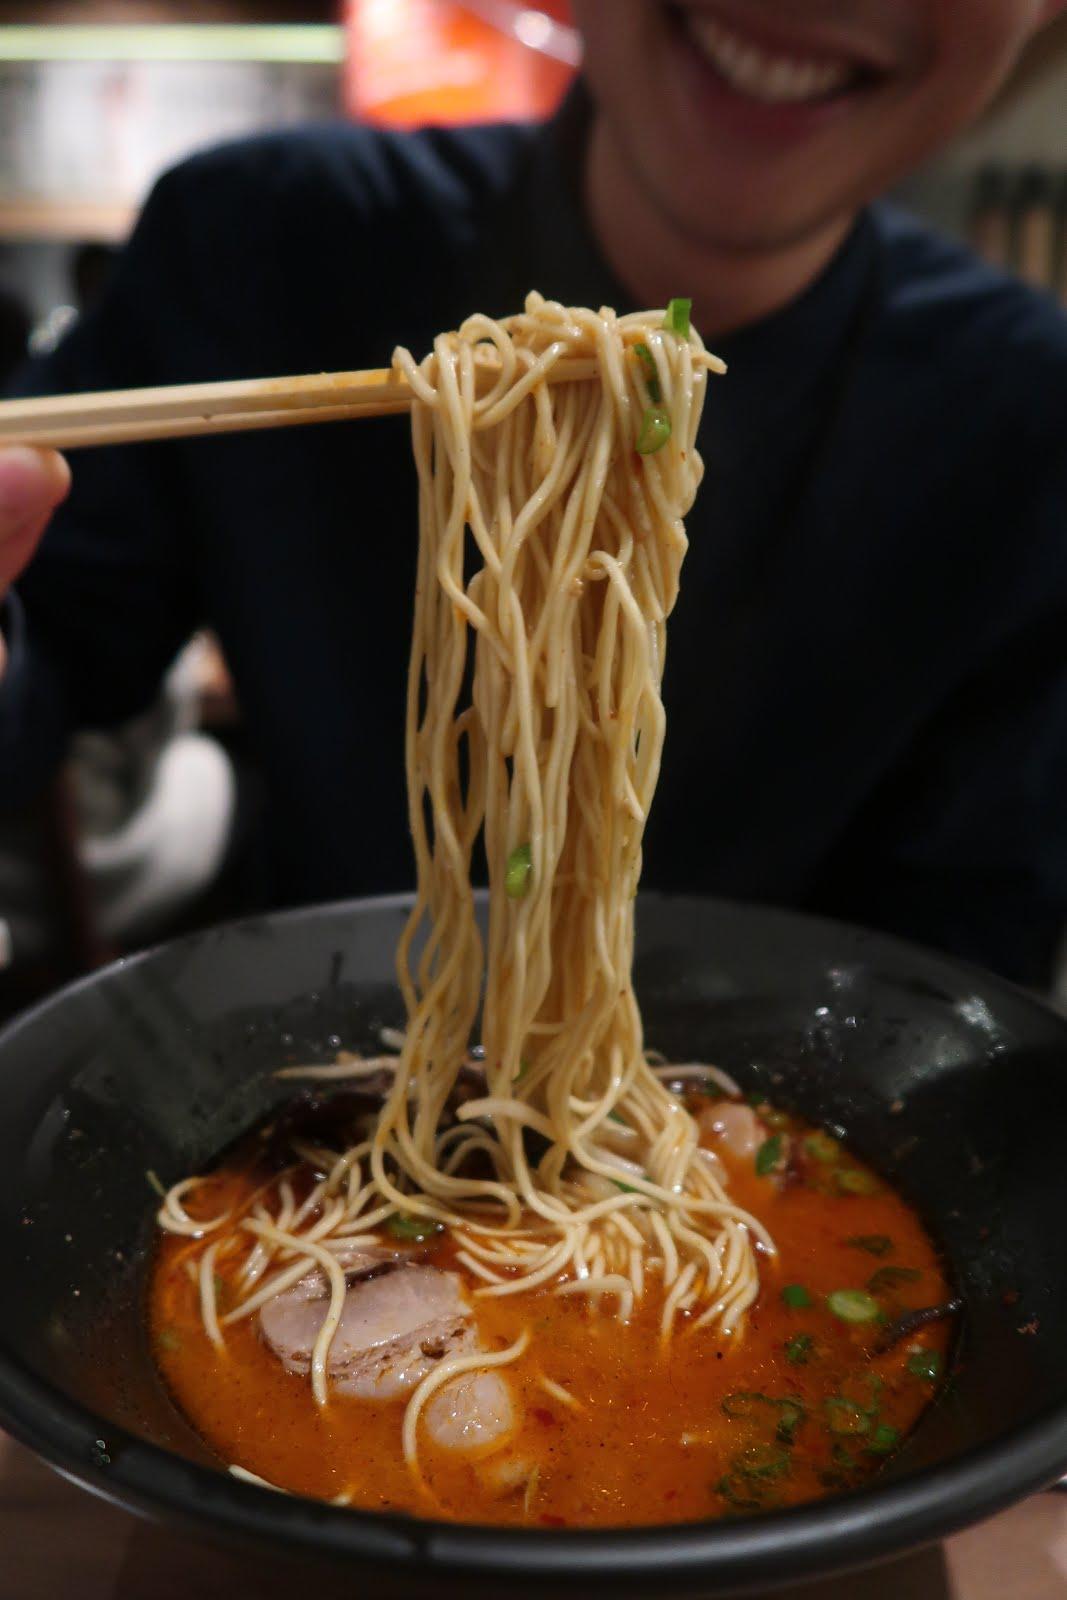 Ippudo's Karaka Spicy Ramen noodles.